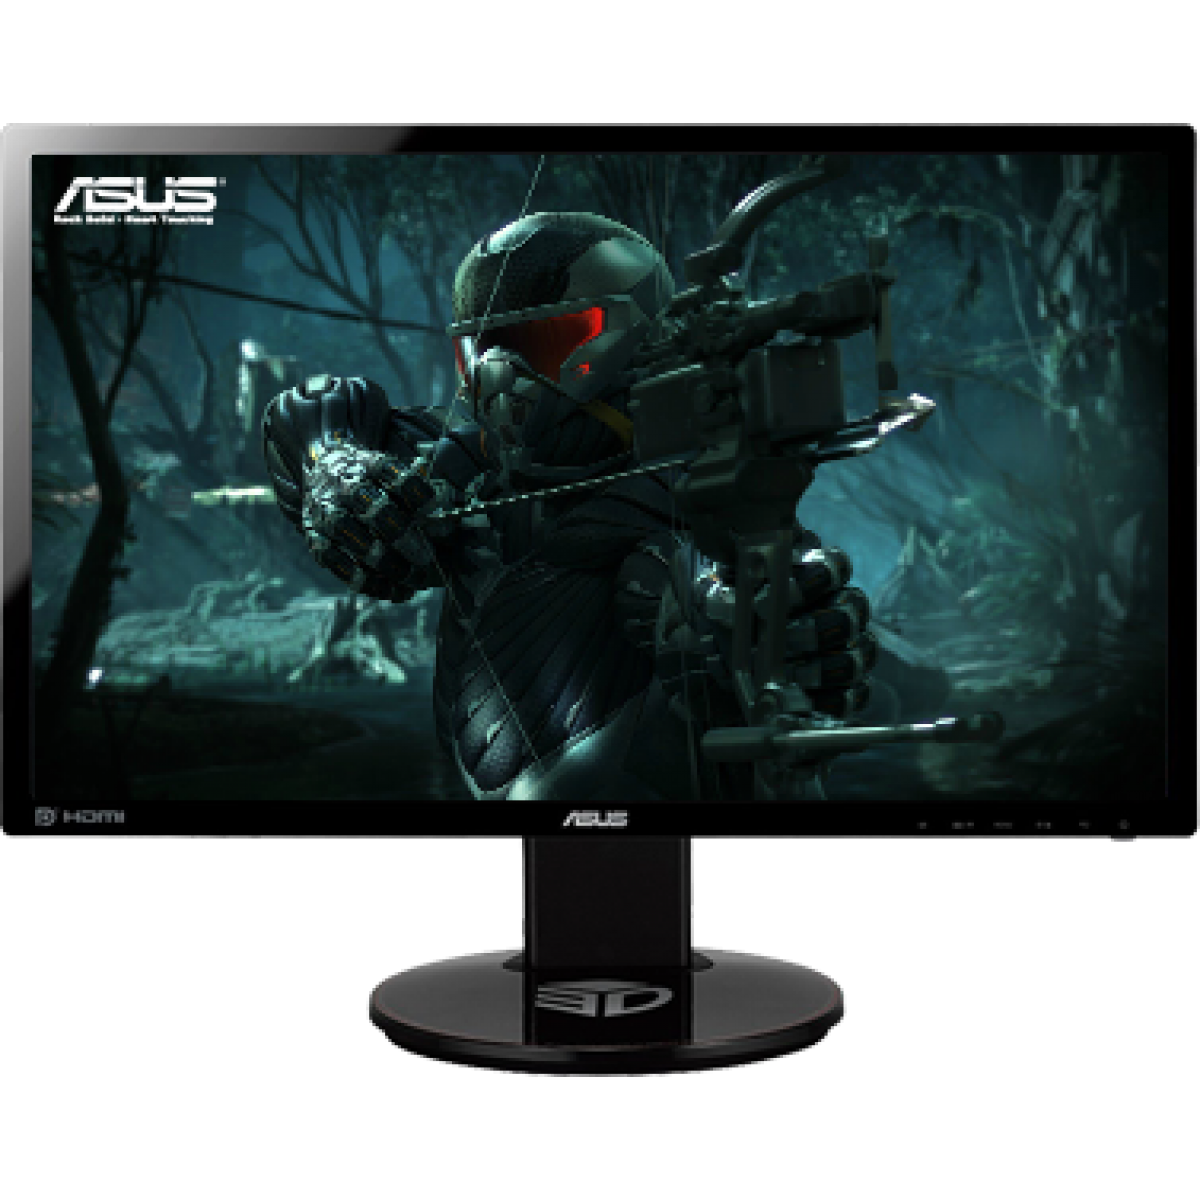 Monitor Gamer Asus 24 Pol, Full HD, 144Hz, 1ms, VG248QE